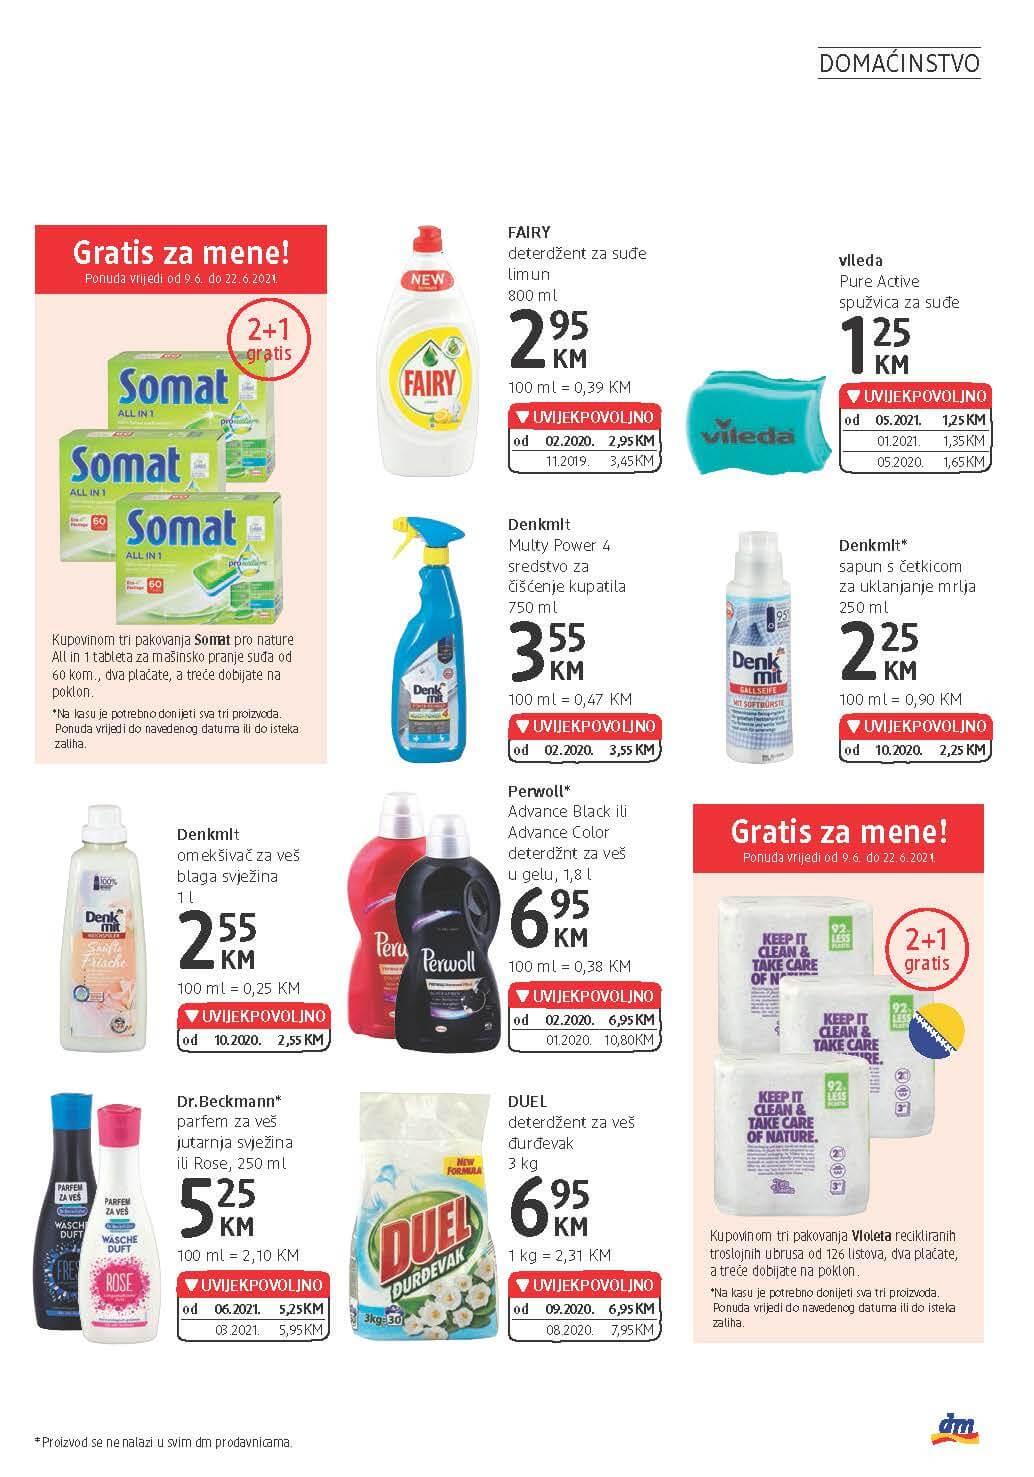 DM Katalog BiH JUN 2021 09.06. 22.06. eKatalozi.com PR Page 21